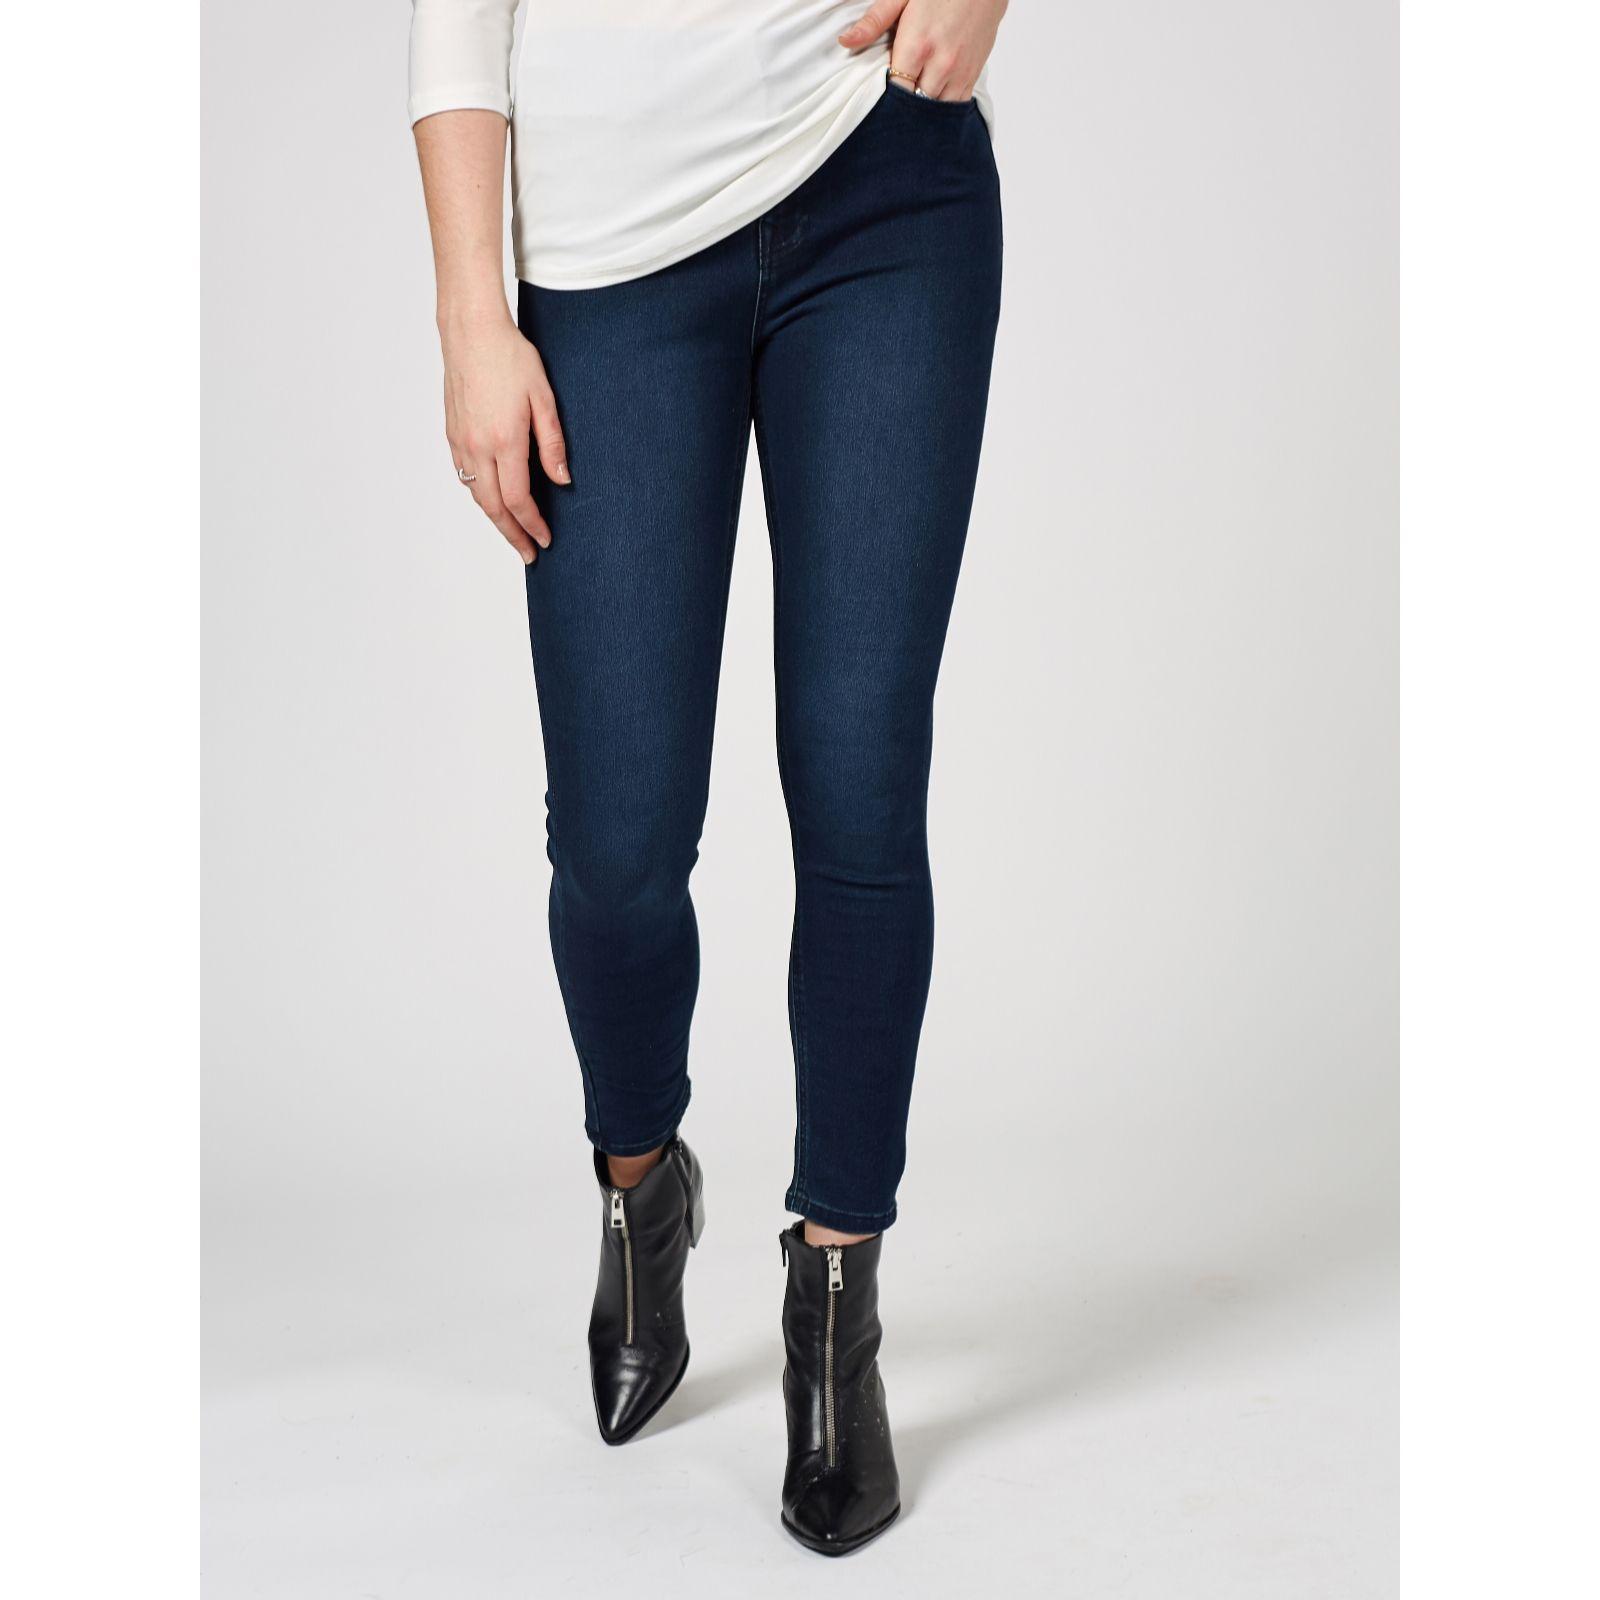 f7067592086 Diane Gilman Skinny Jeans Functional Zip - QVC UK